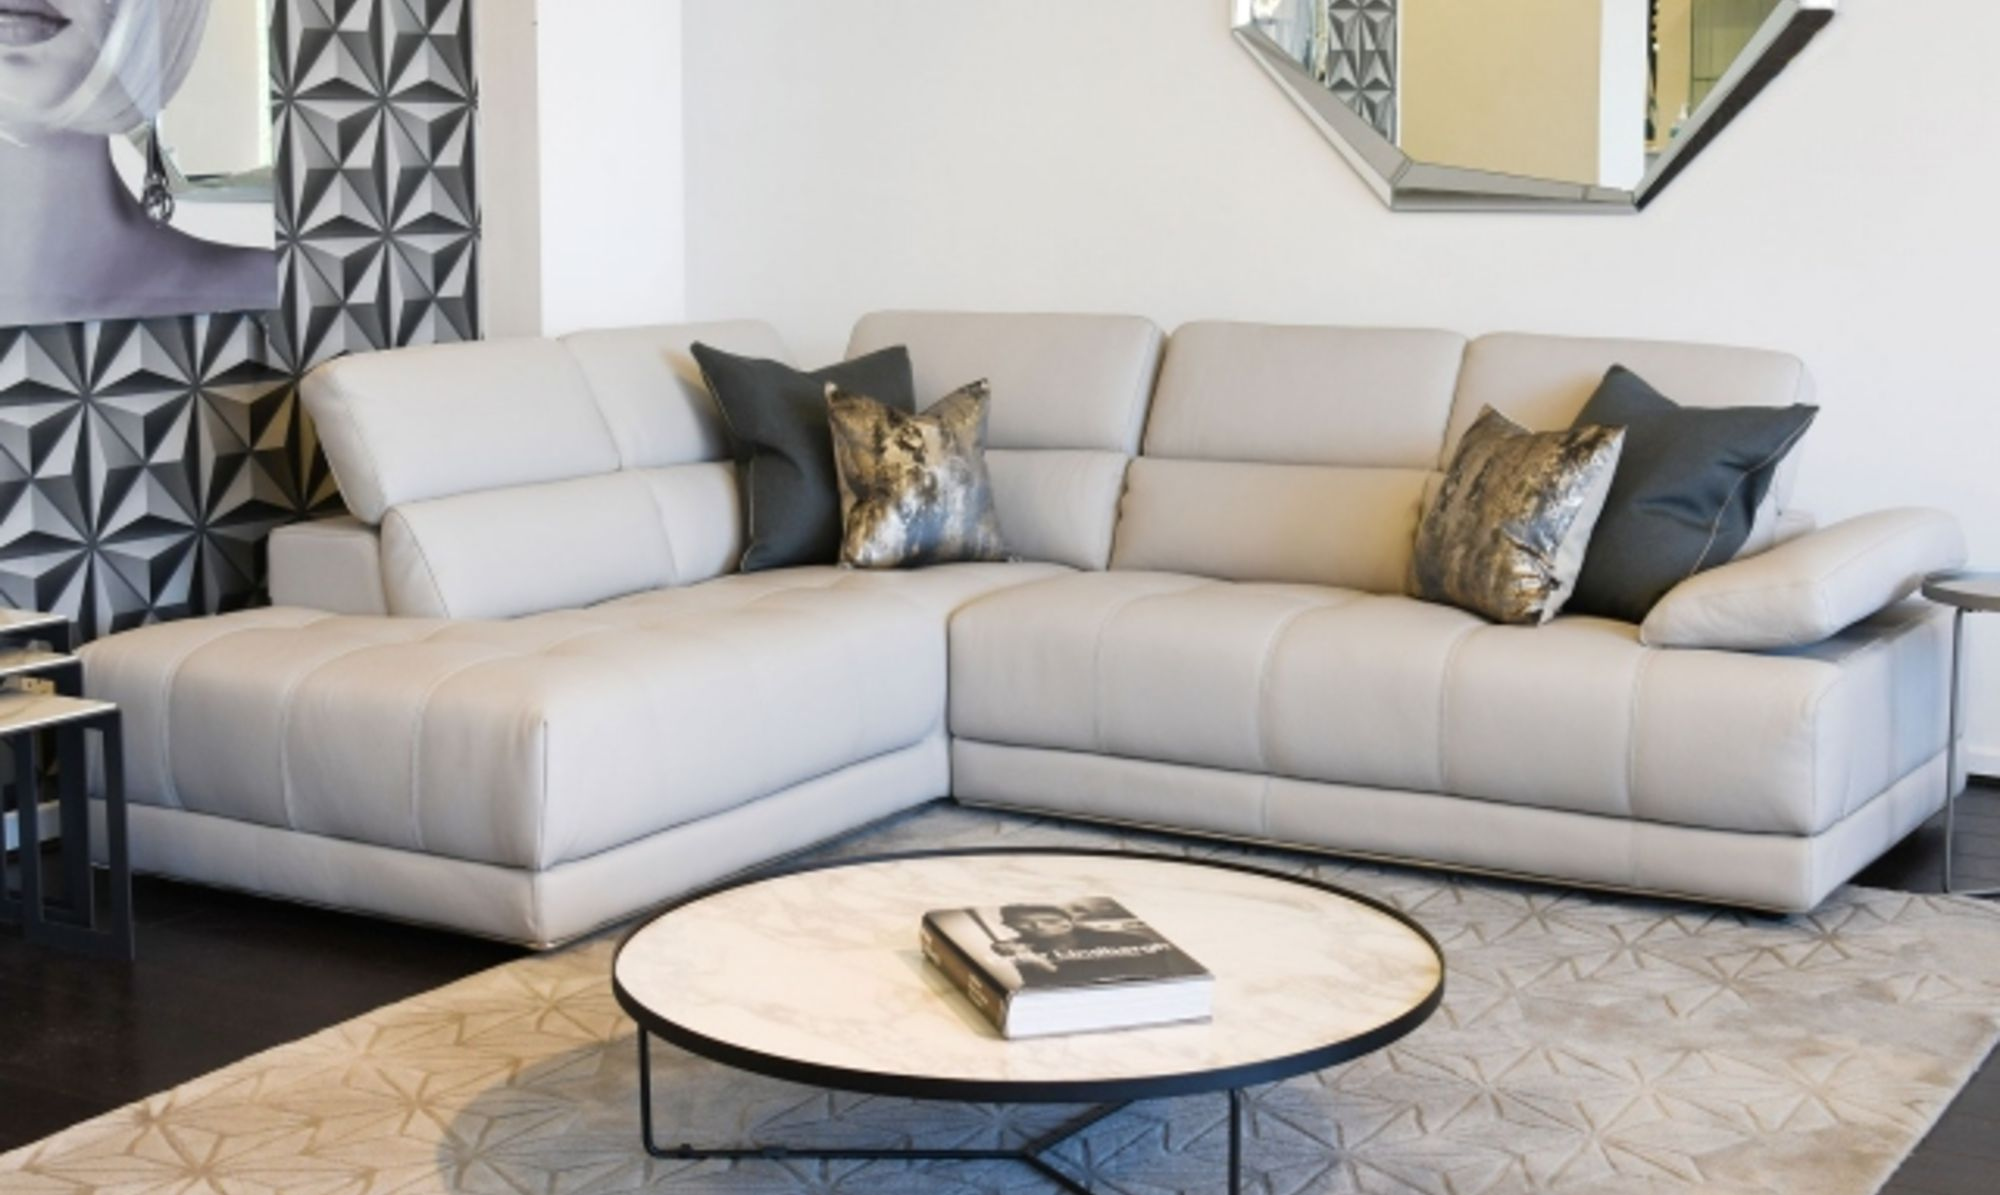 3 Ways To Style Up Your White Leather Sofa Fishpools Lifestyle